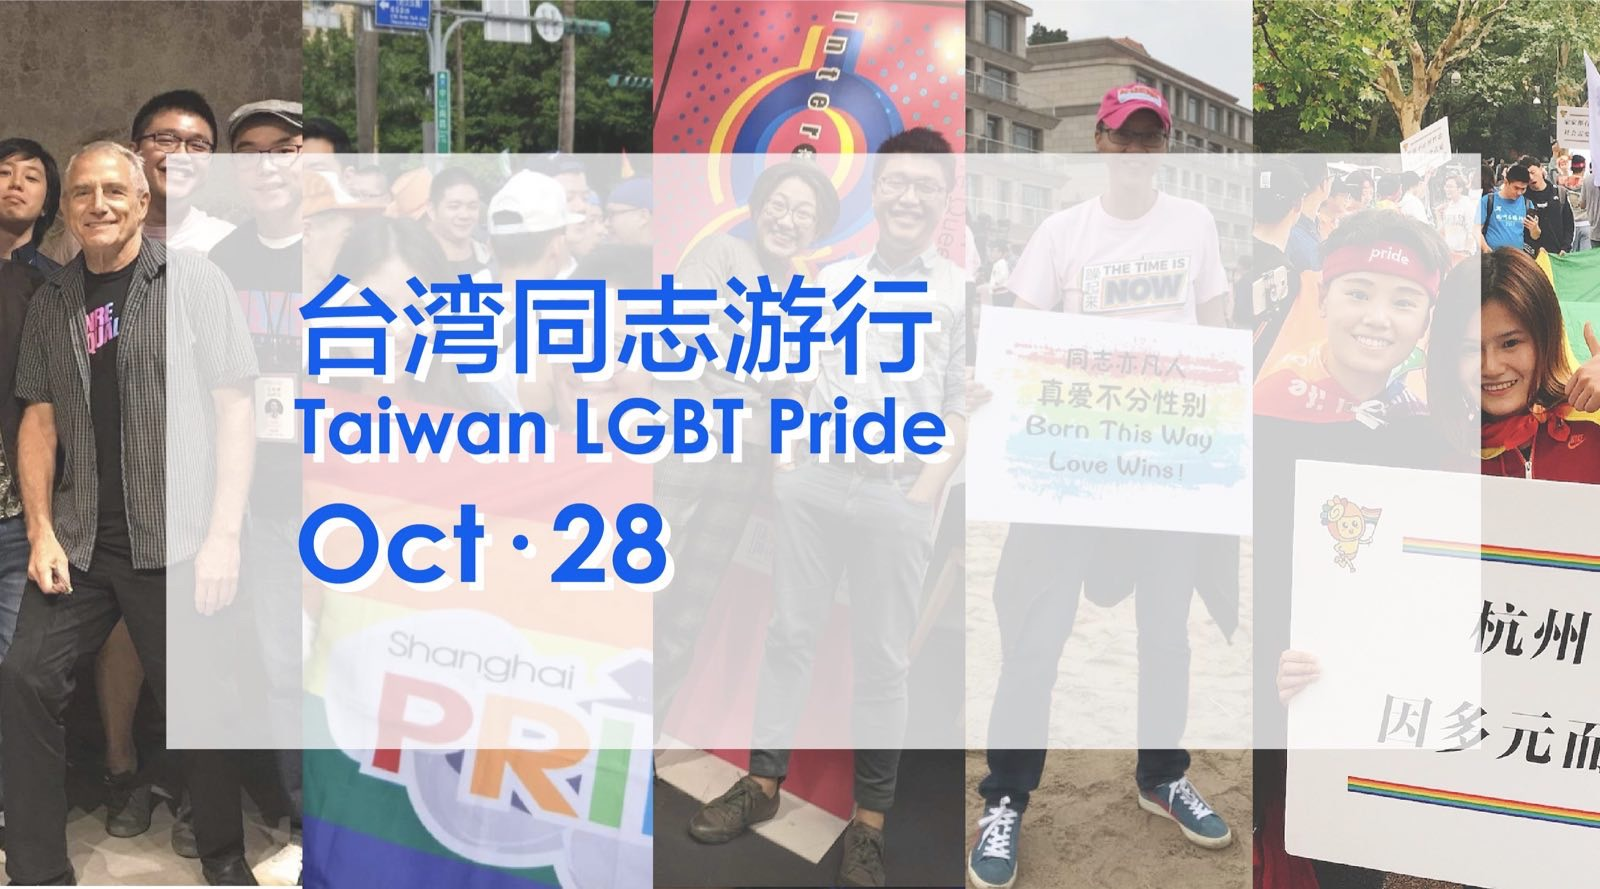 171112_taiwan-lgbt-pride_01-poster